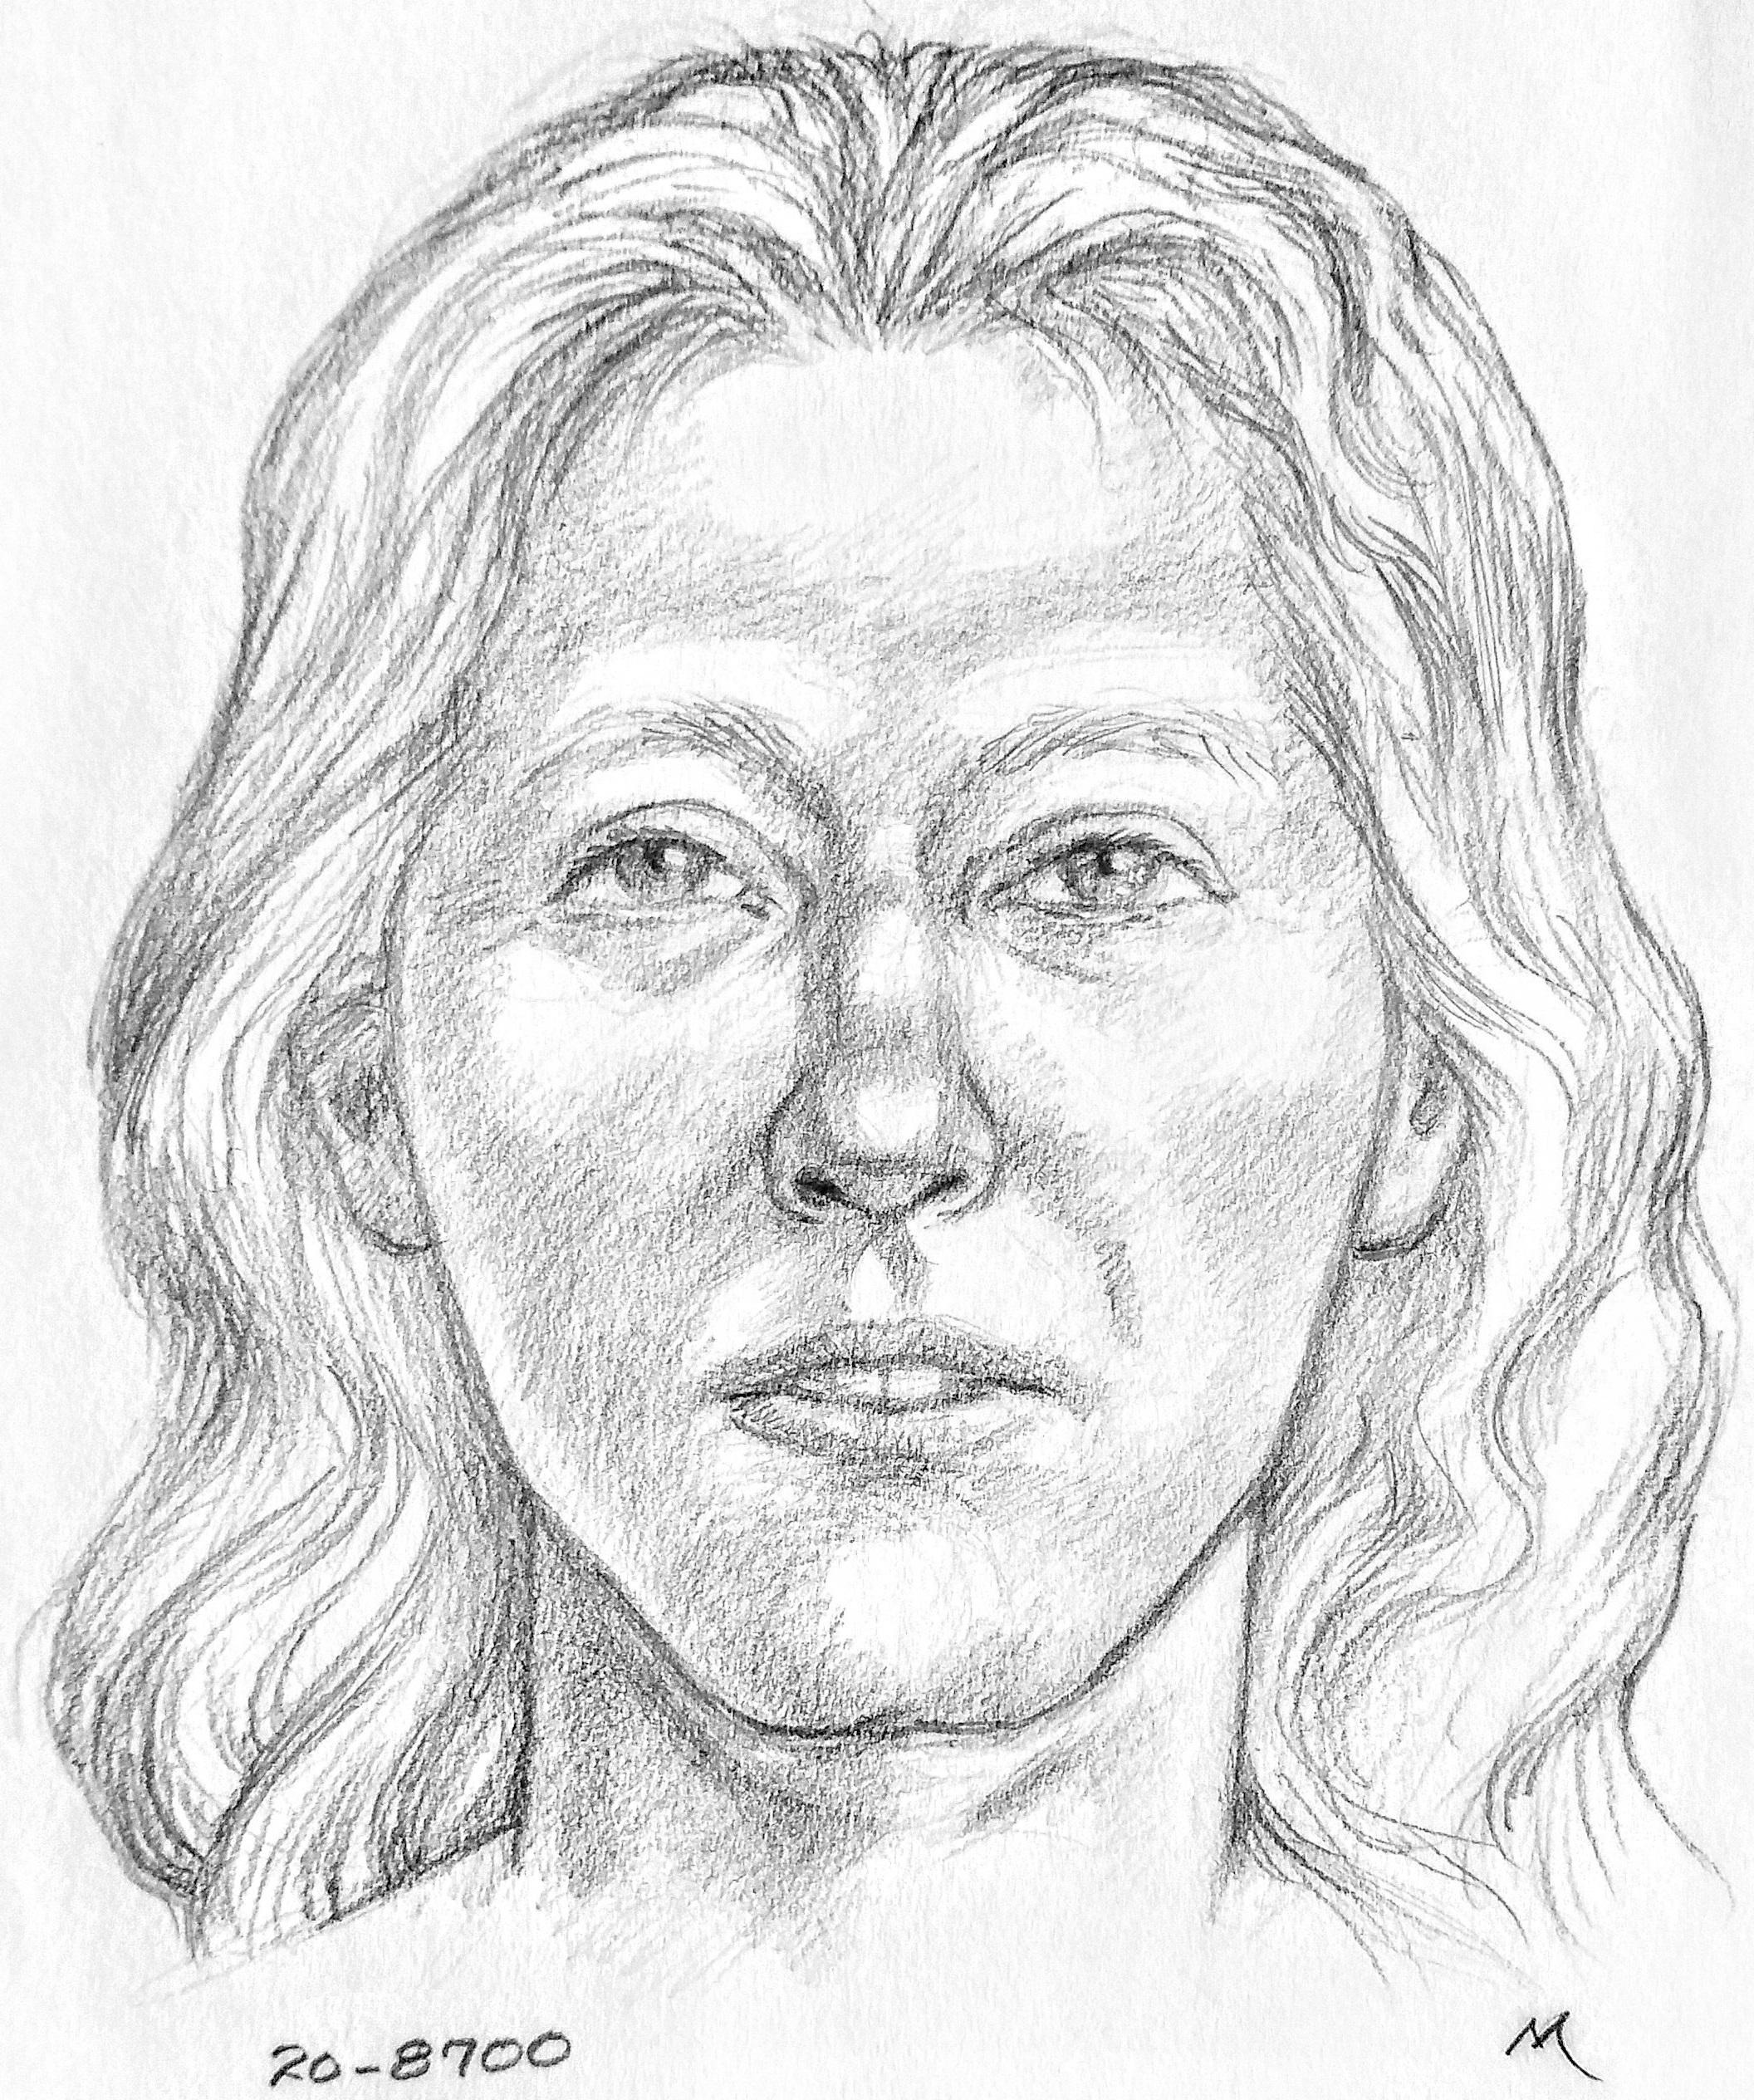 Maricopa County Jane Doe (August 2020)